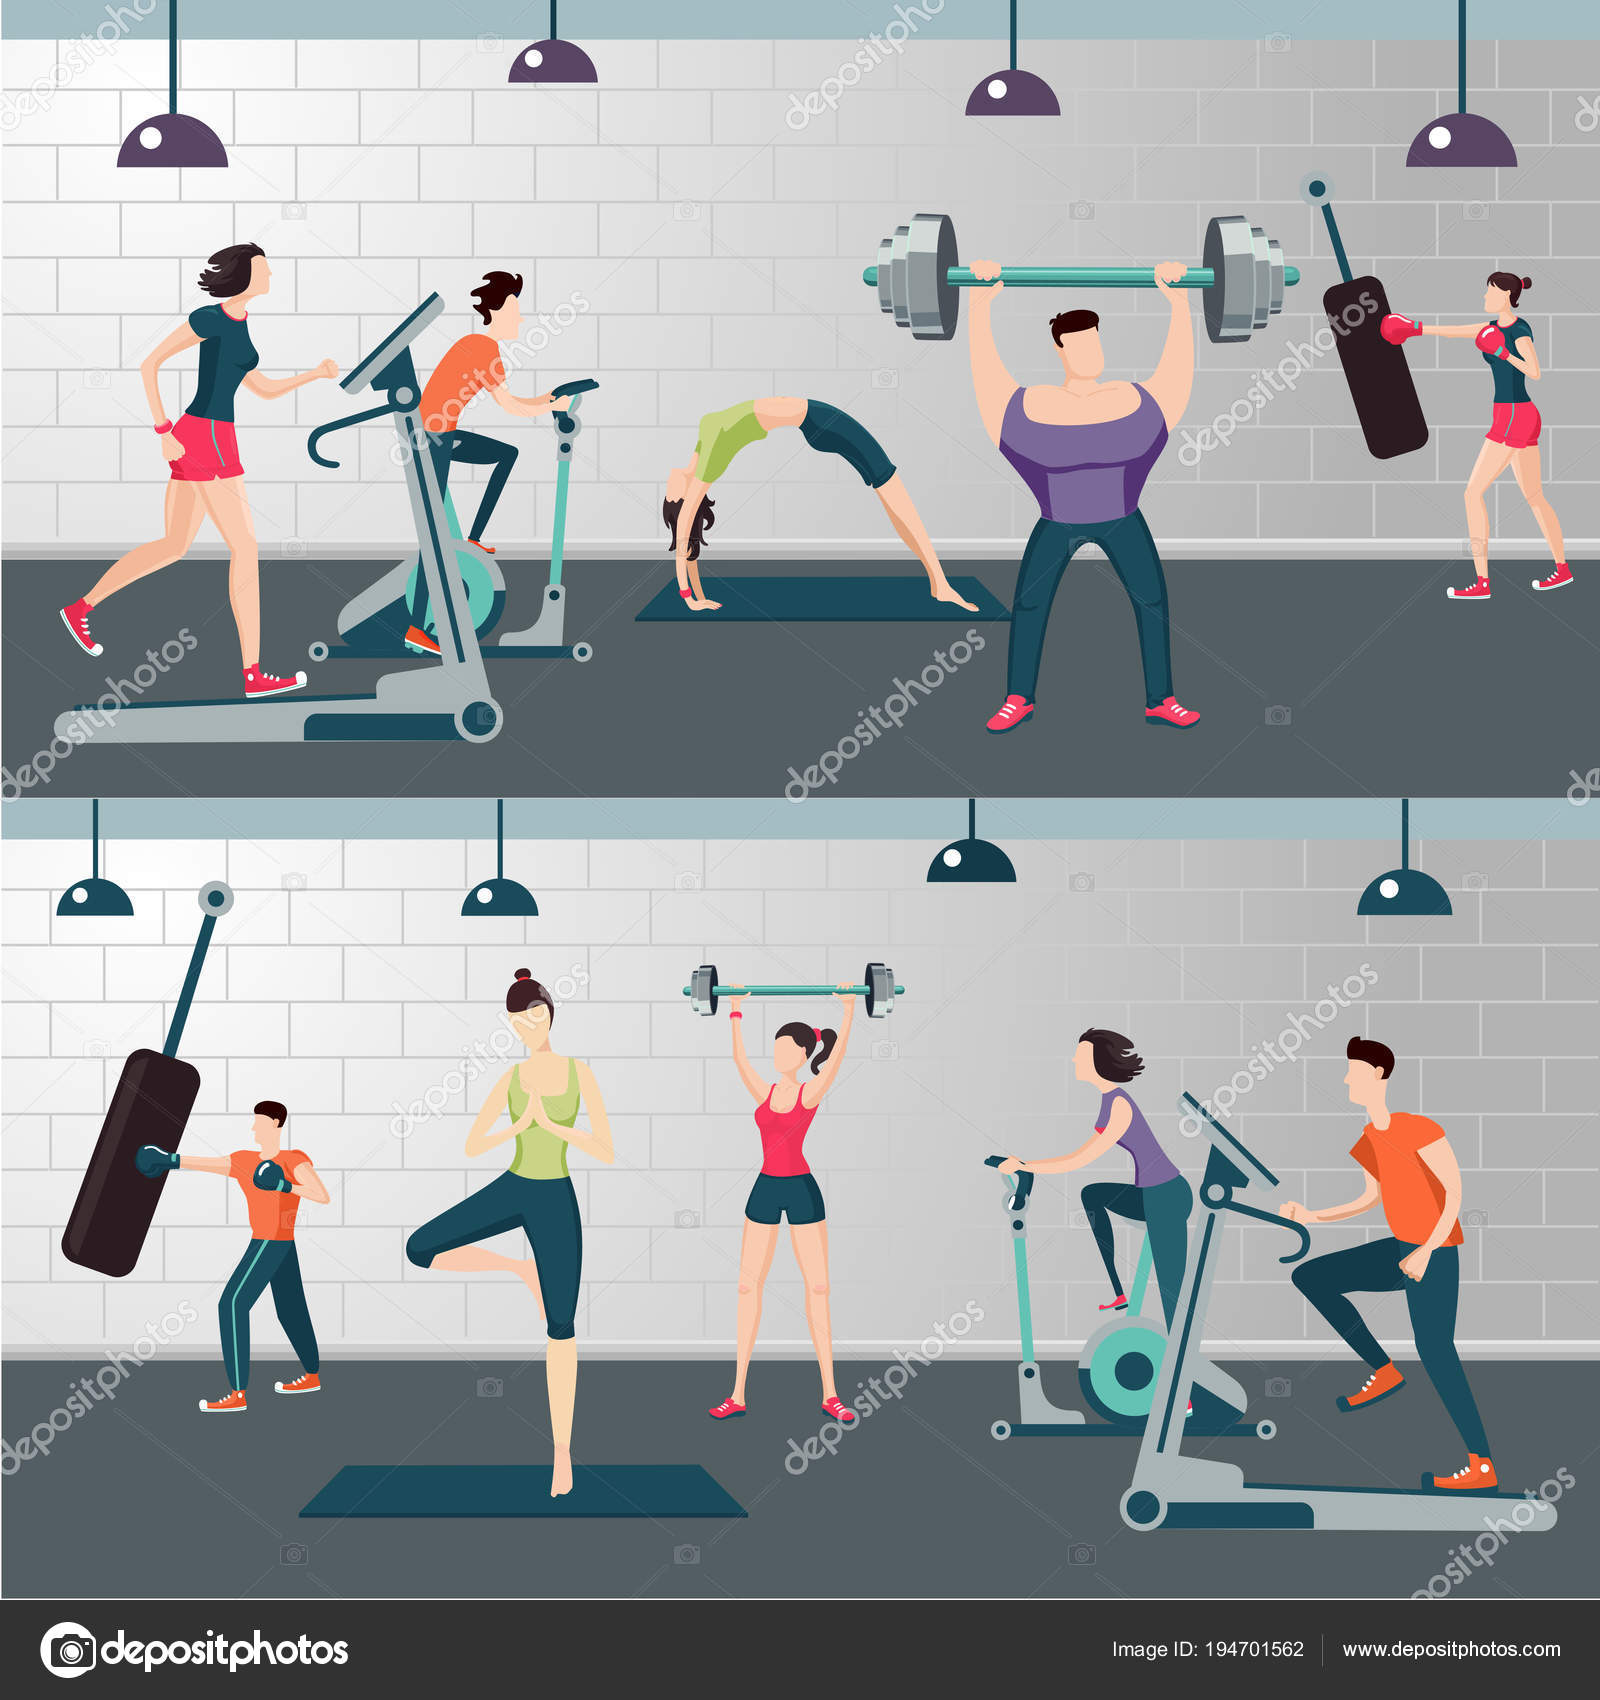 Luxury gym room images stock photos vectors shutterstock